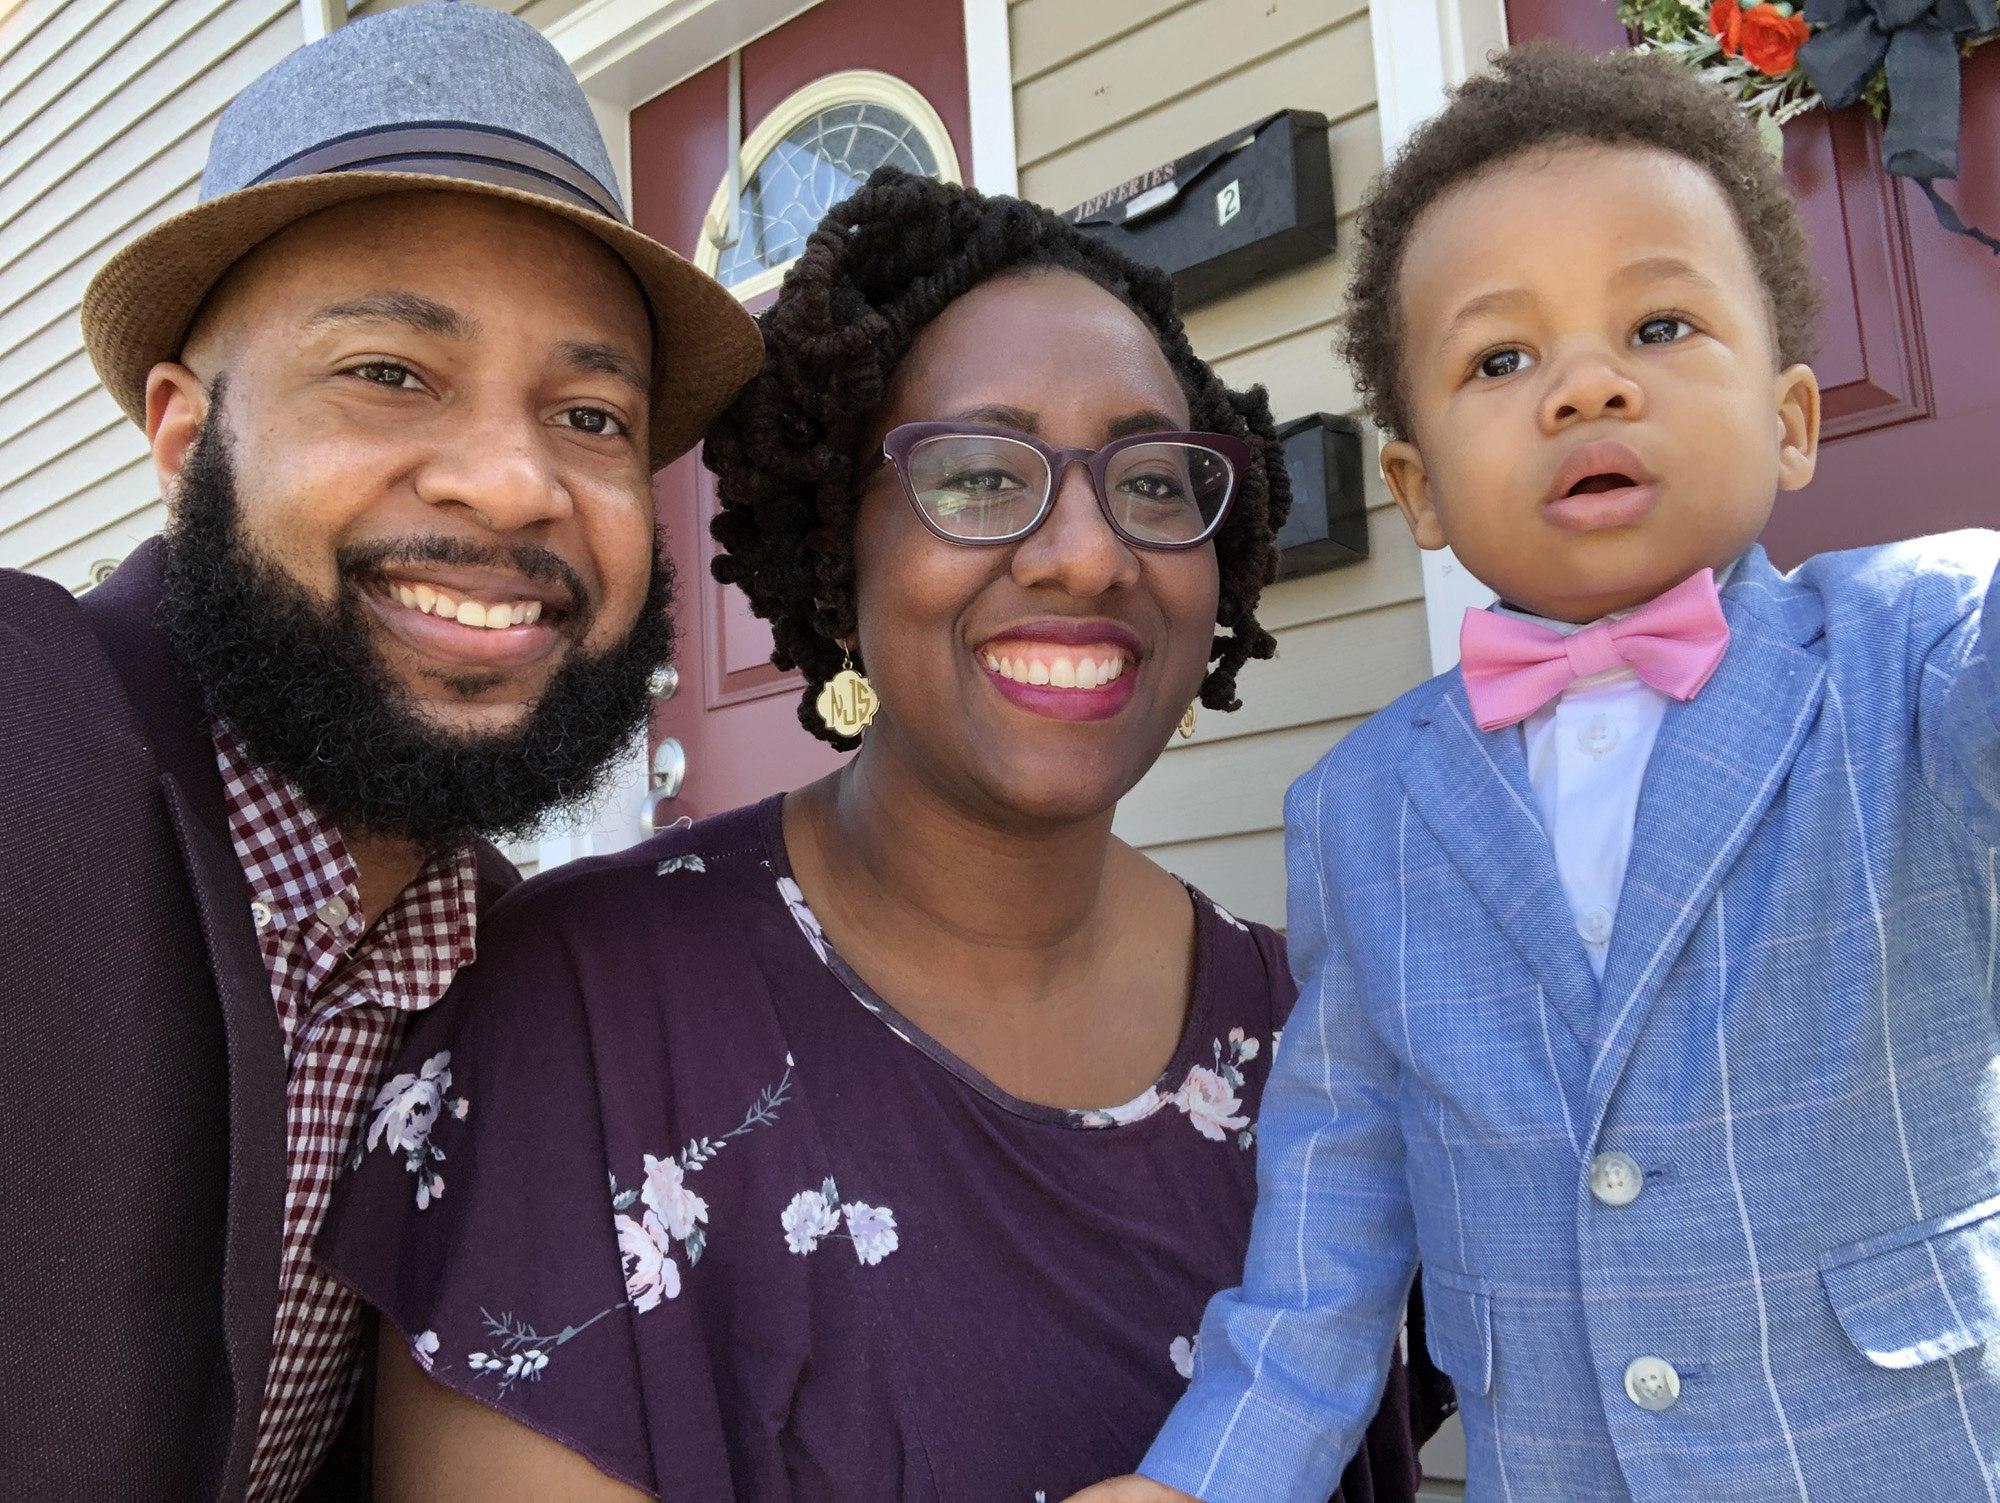 The Jefferies family: Joshua, Sonia, and Josiah.